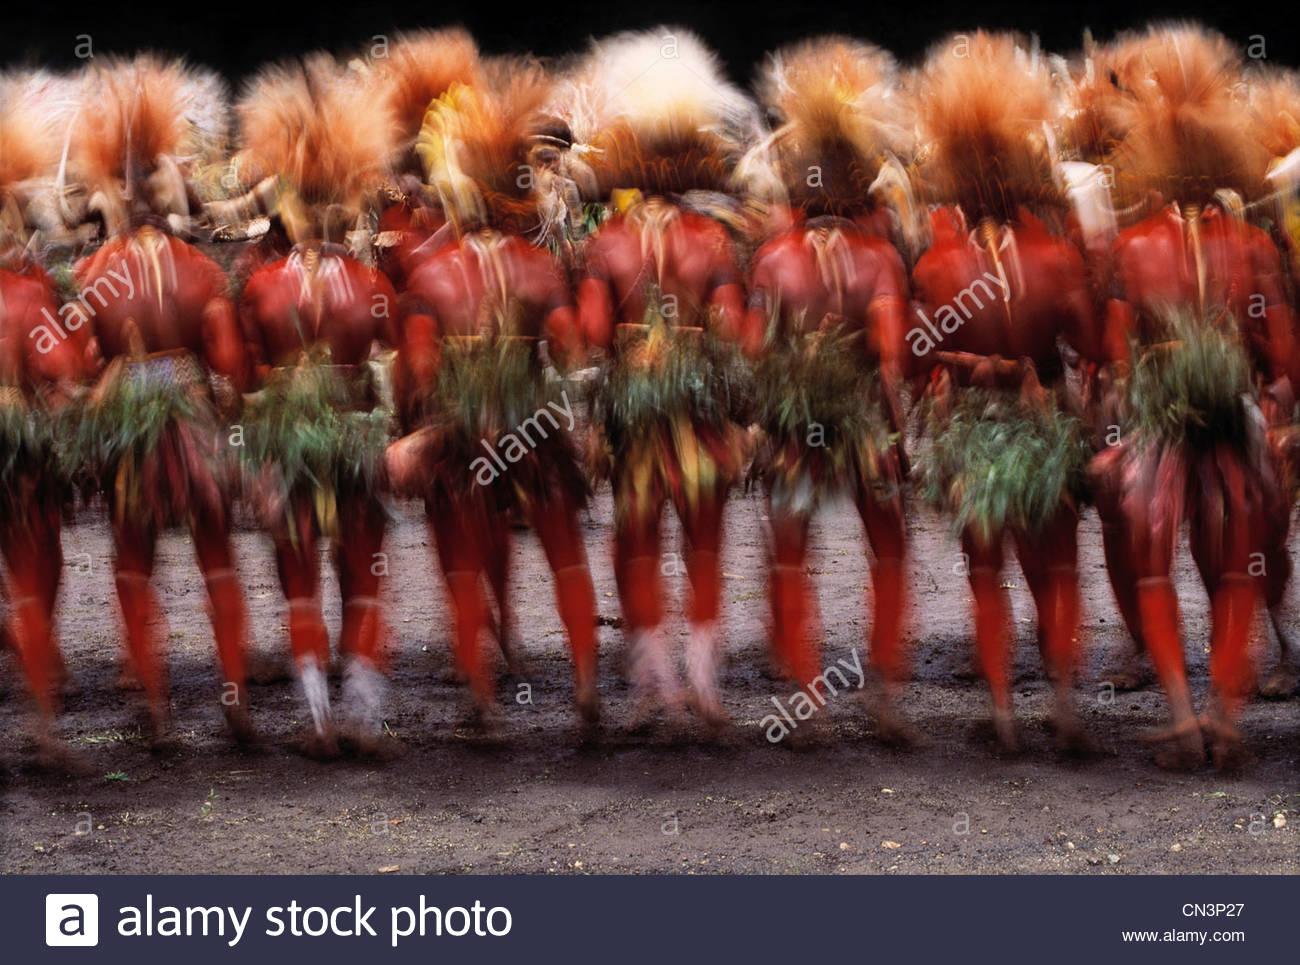 Huli tribesmen perform at singsing at Mount Hagen, Papua New Guinea - Stock Image